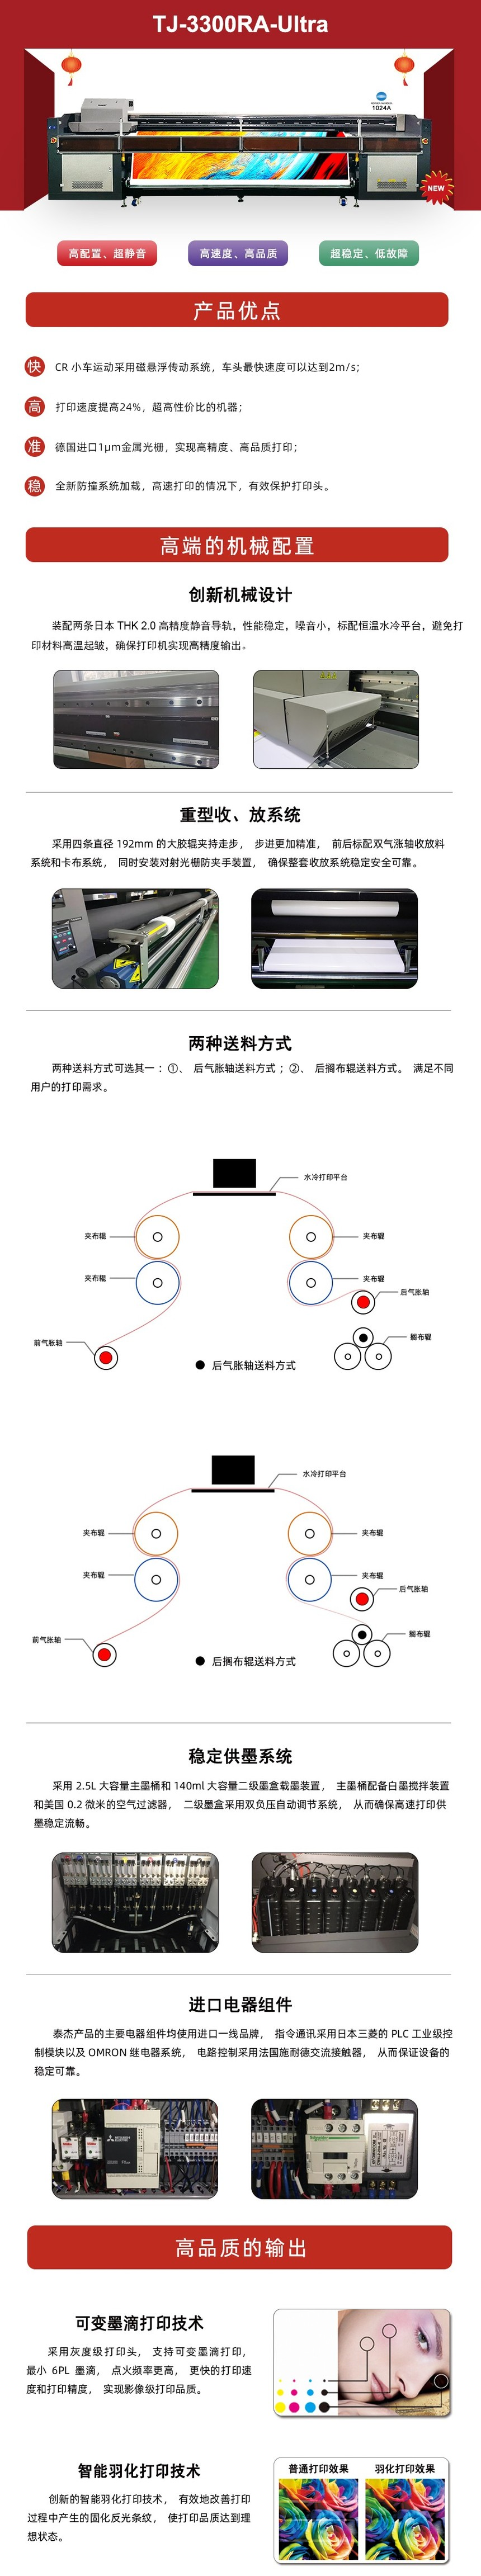 TJ-3300RA-Ultra中文产品说明(1).jpg